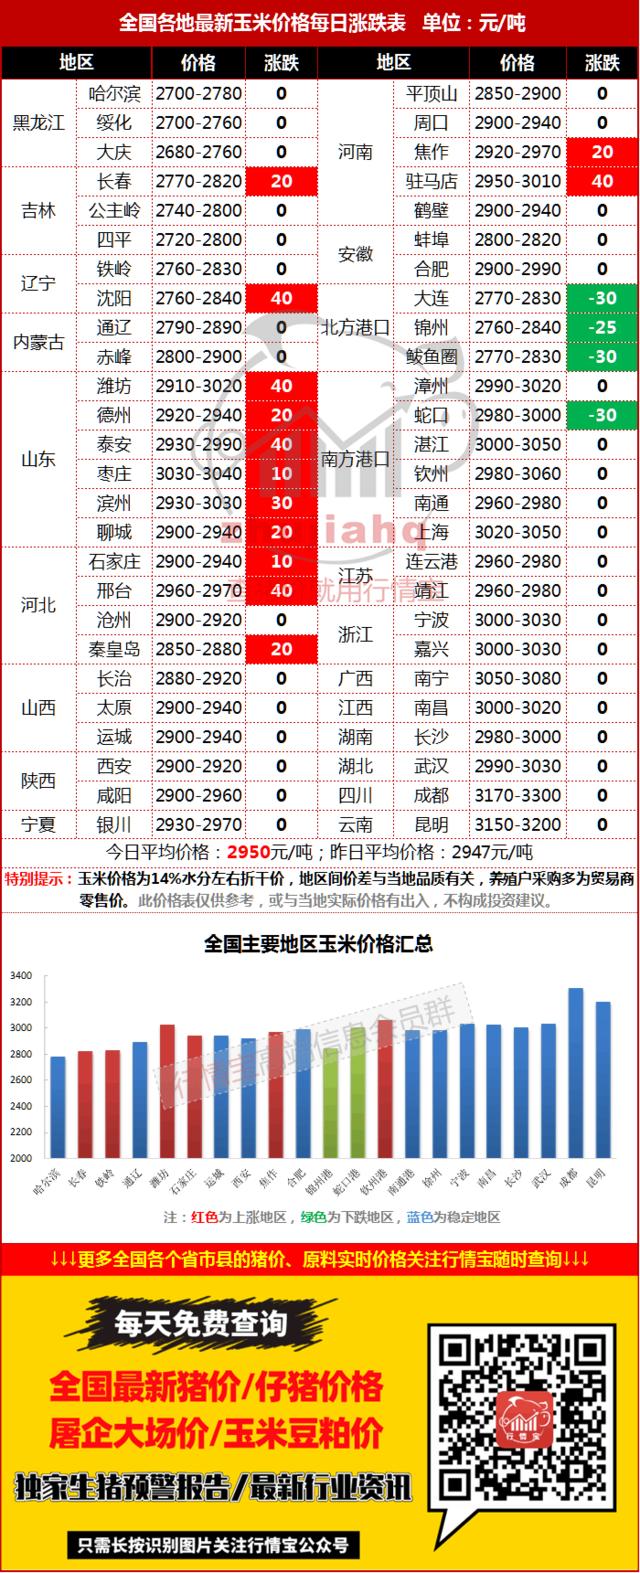 https://files.nxin.com/public/jiagong/2021/5/24/d7/62571750-1a2a-4639-800b-06cd16e5e25a_m.png